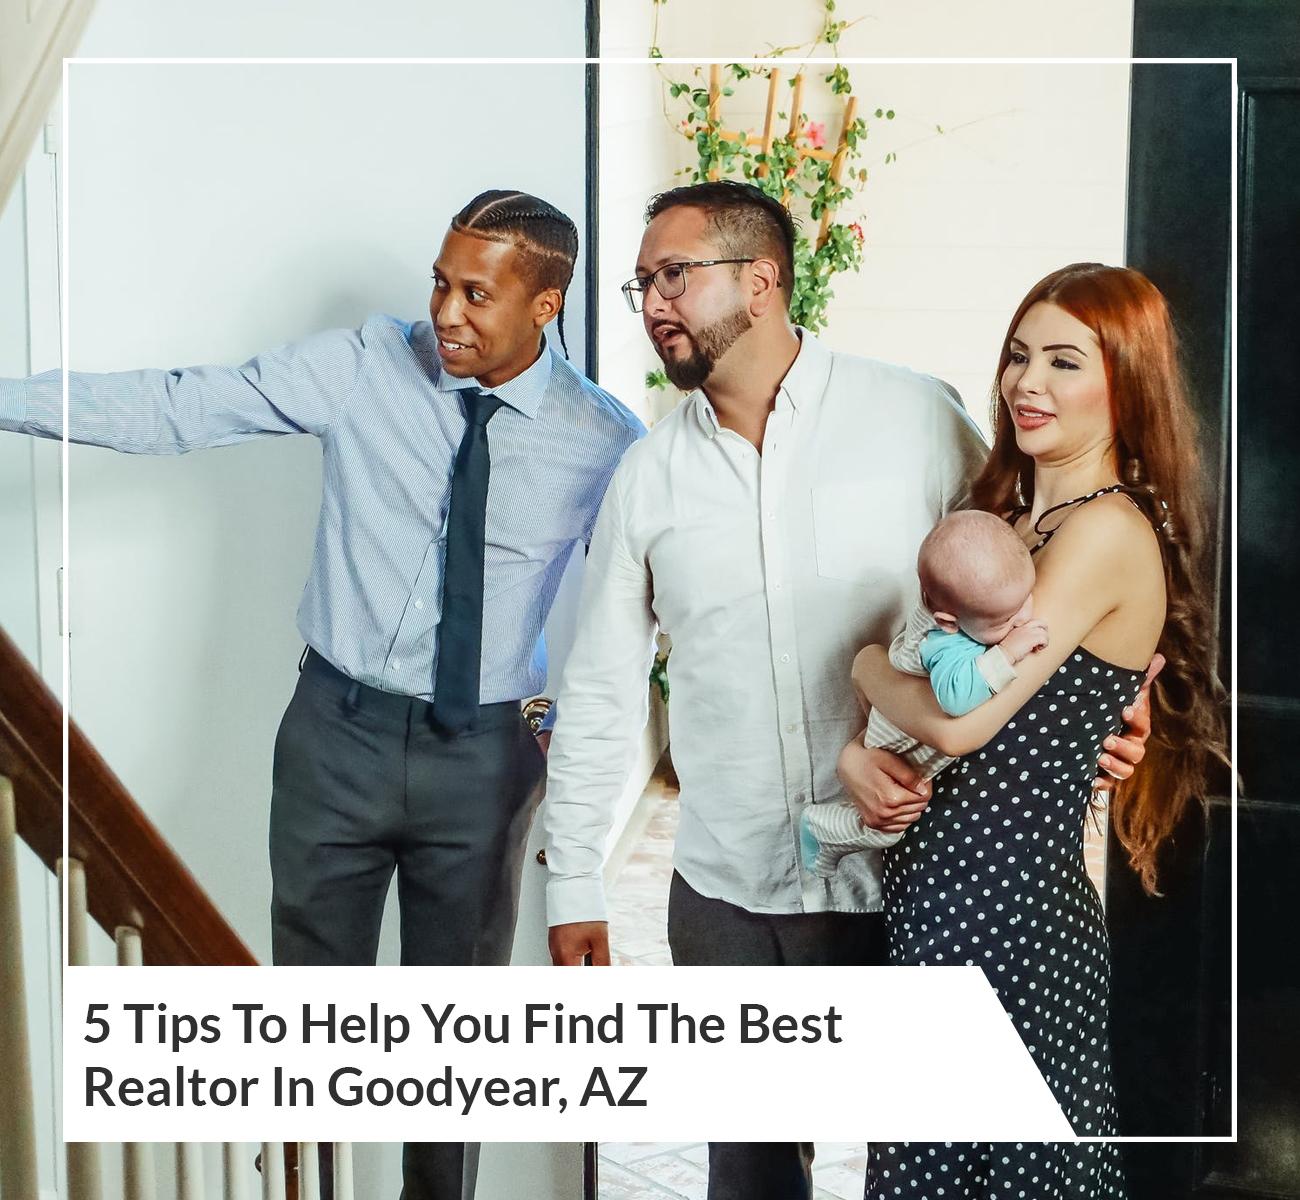 Finding The Best Realtor Goodyear, AZ